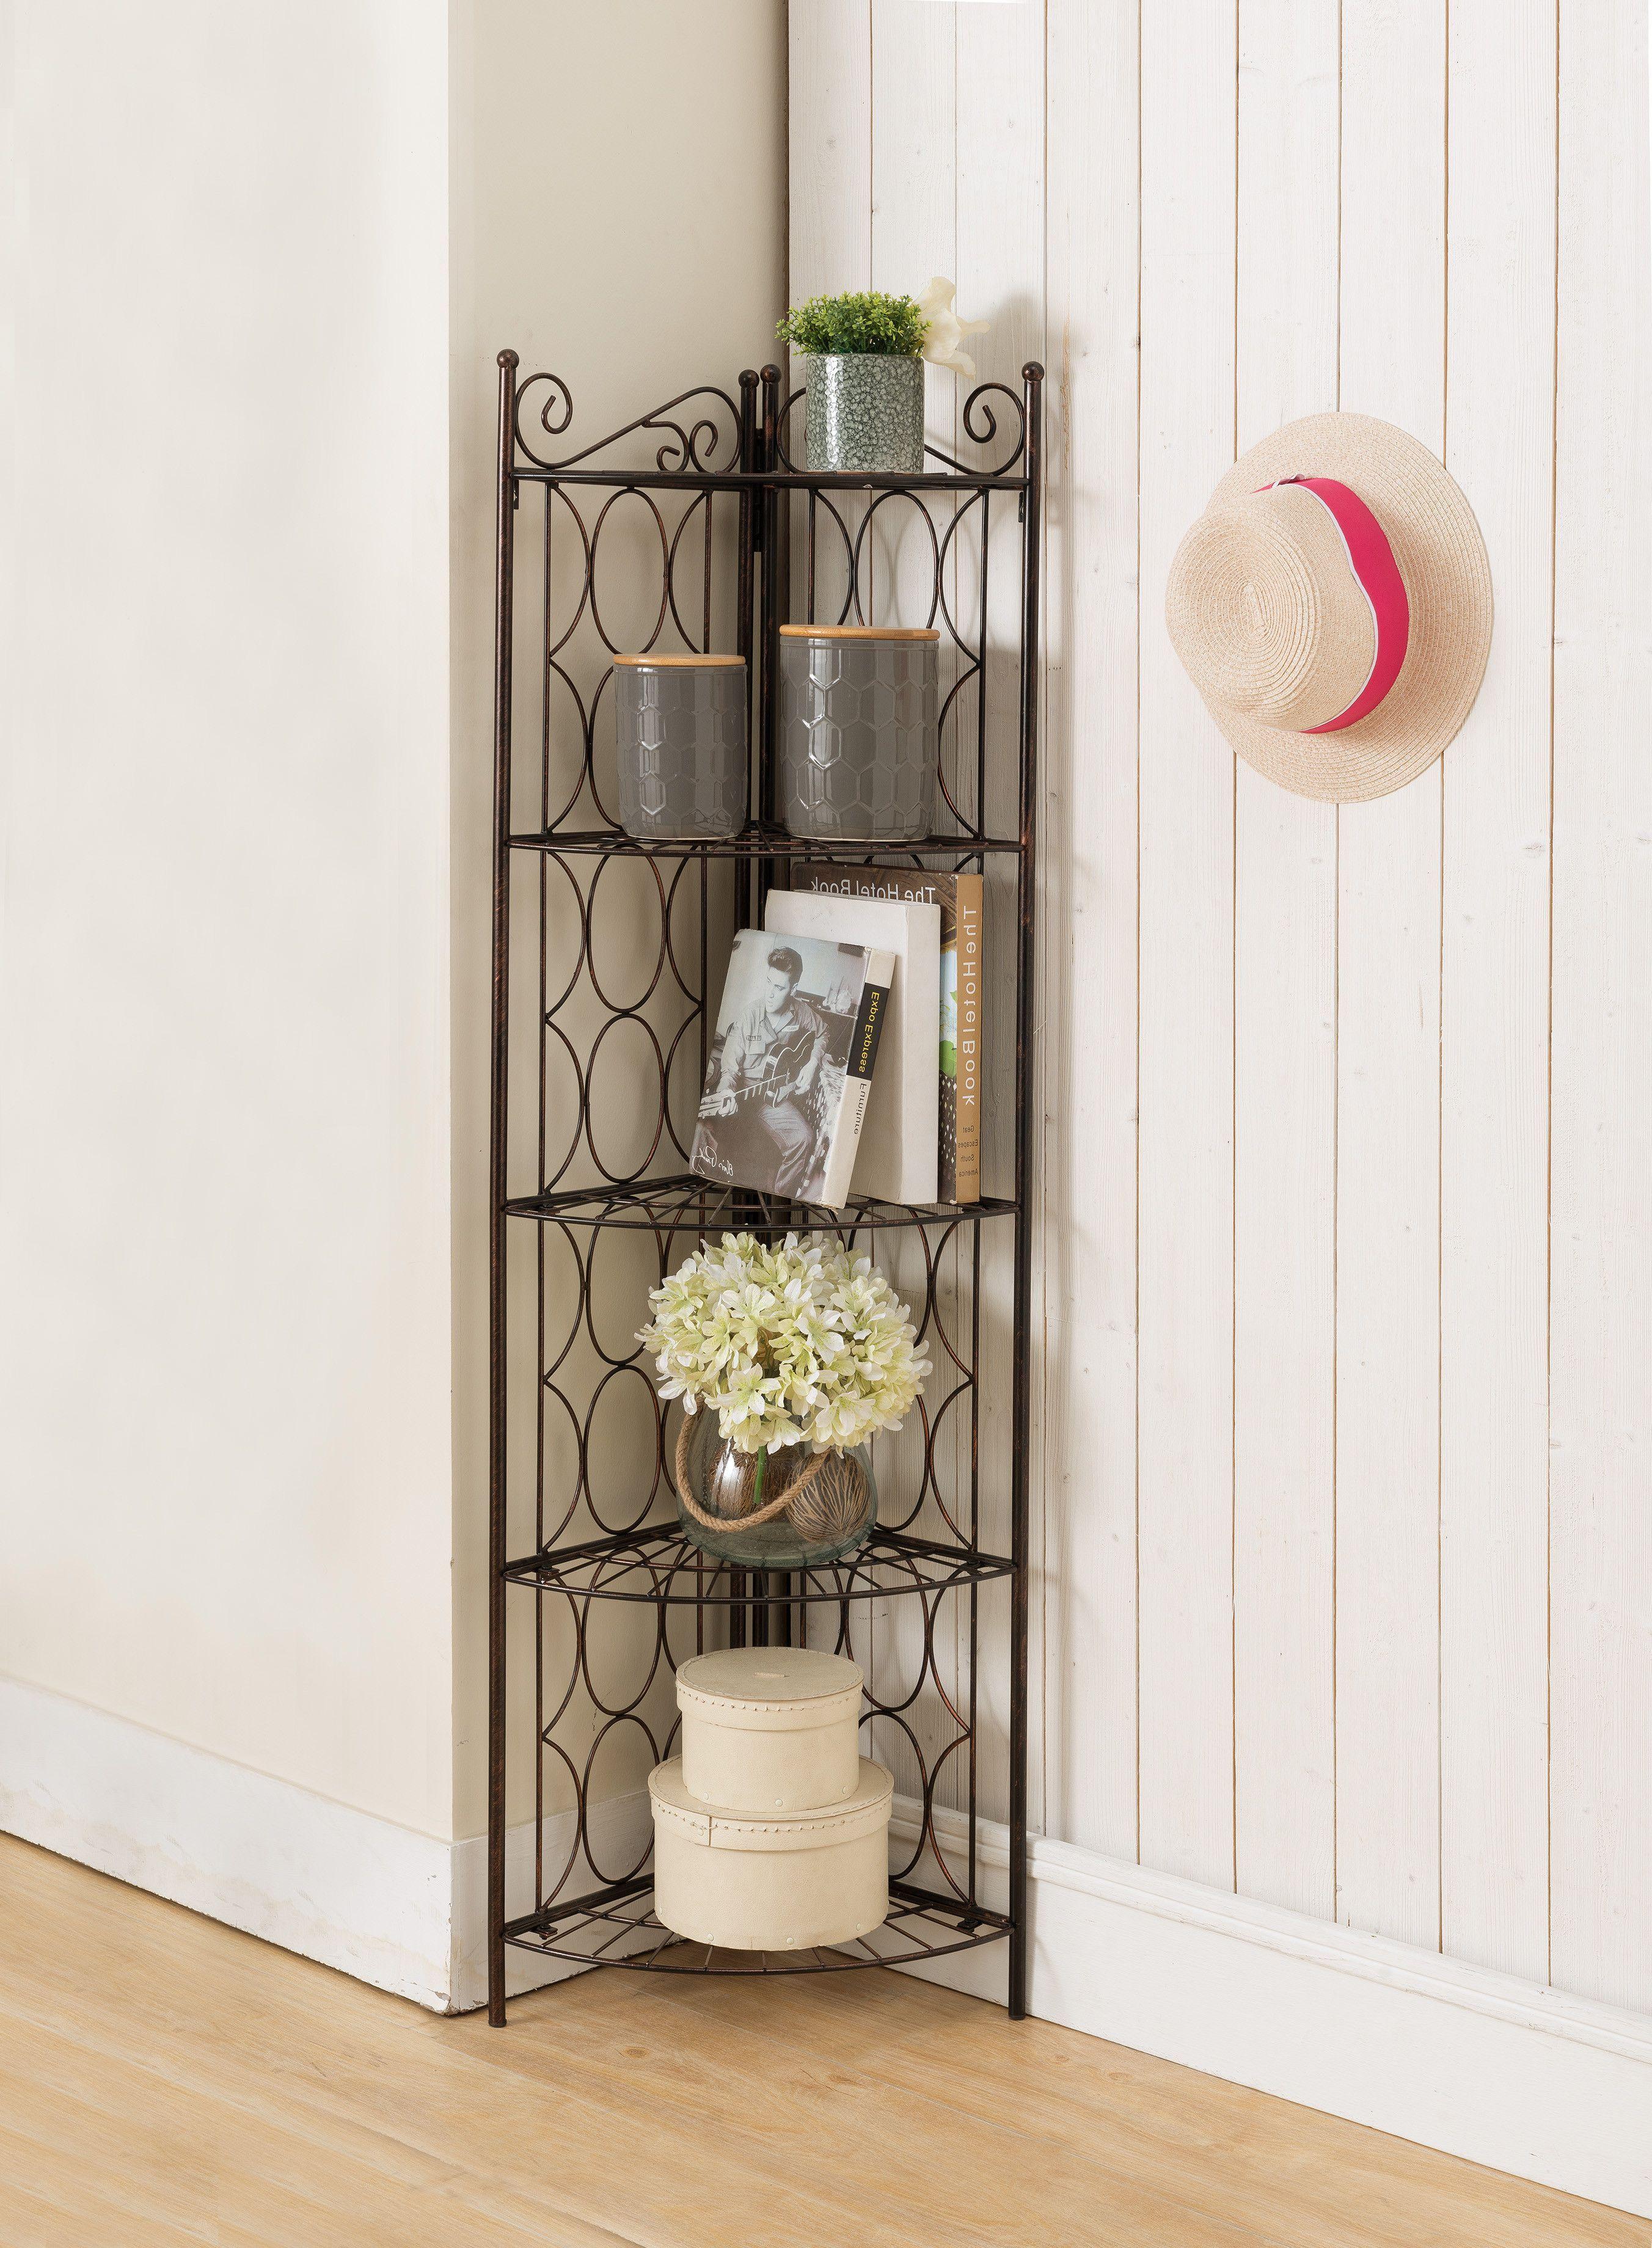 Brushed Copper Metal 5 Tier Transitional Corner Bookshelf Organizer Display Unit